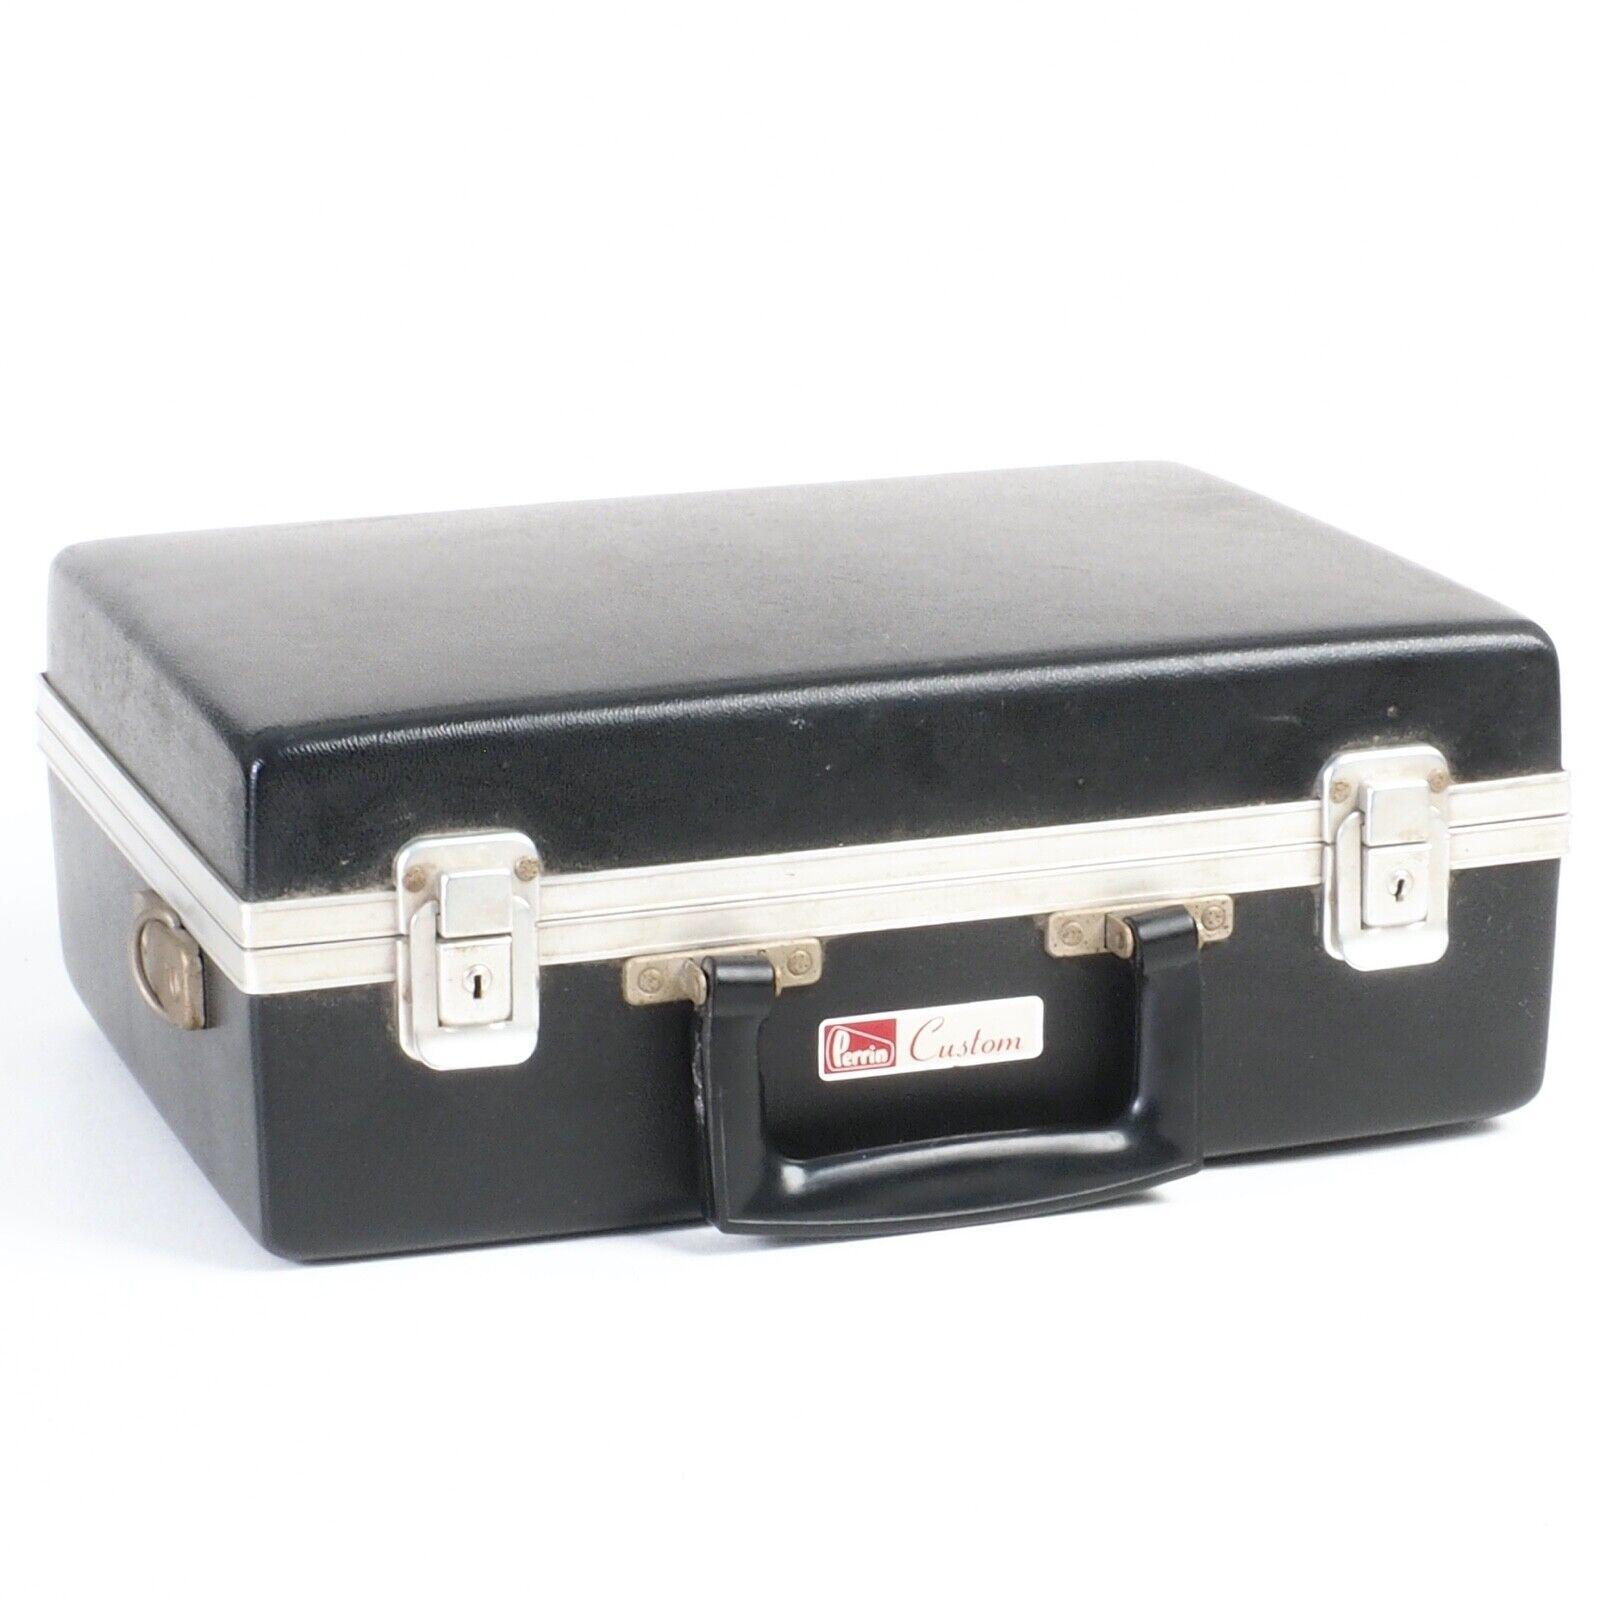 ^ Perrin Custom Camera Black Hardcase w/ Pre Cut Inserts [EX]